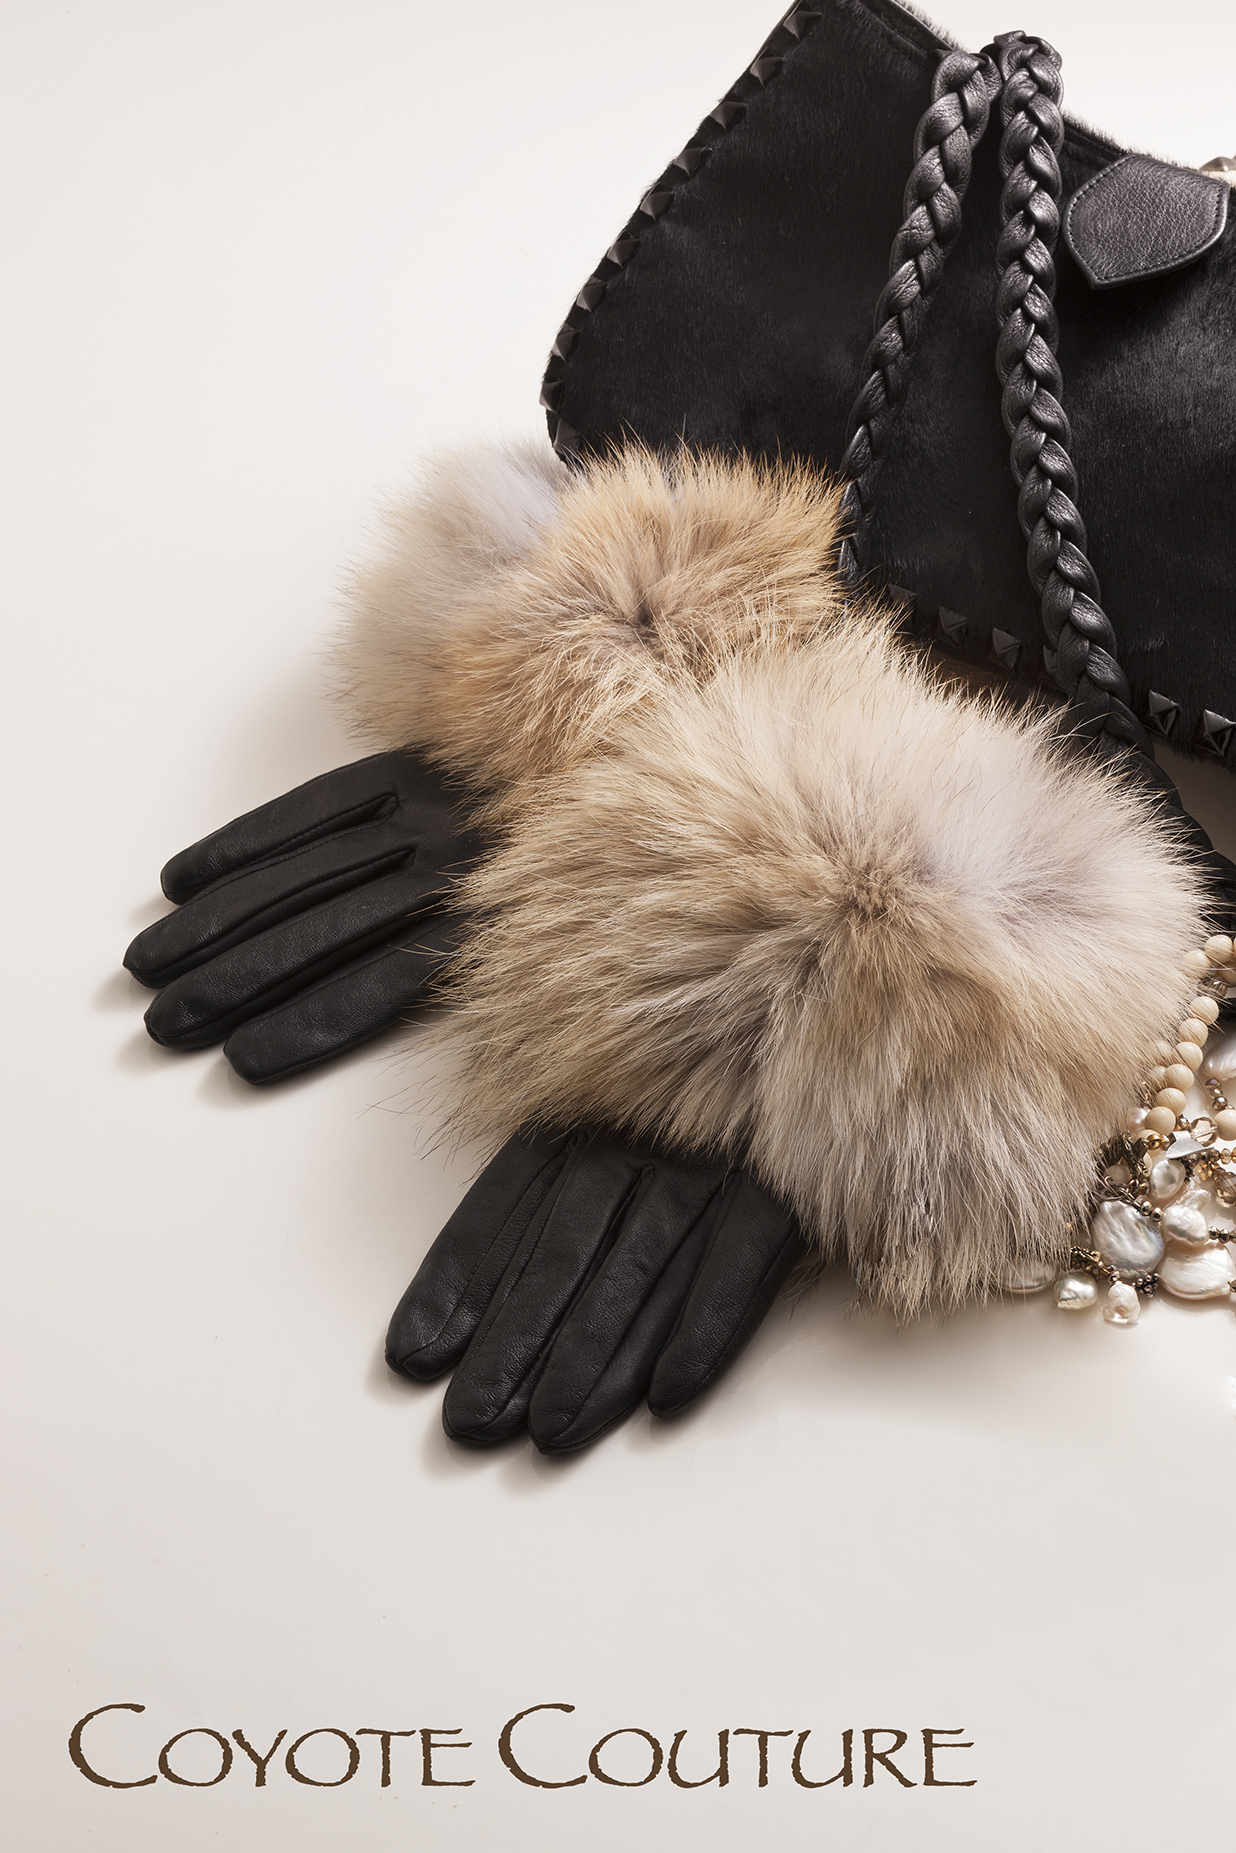 Glove and Purse CCCLogo jpeg.jpg